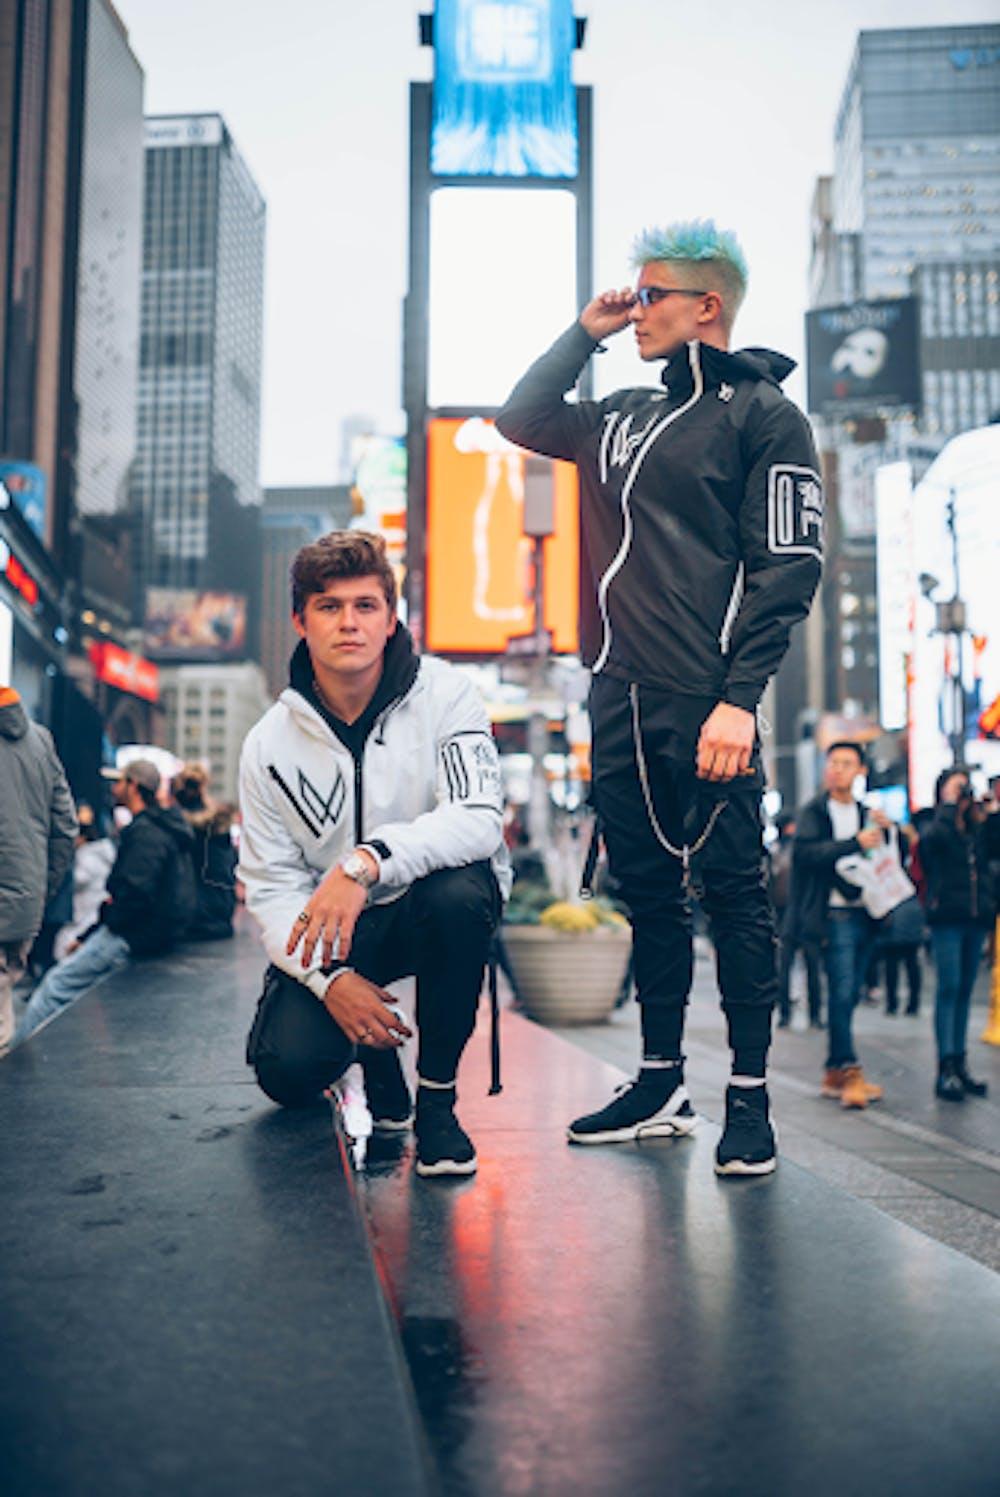 Lifestyle brand McEw showcases maverick mindset through clothing and striving